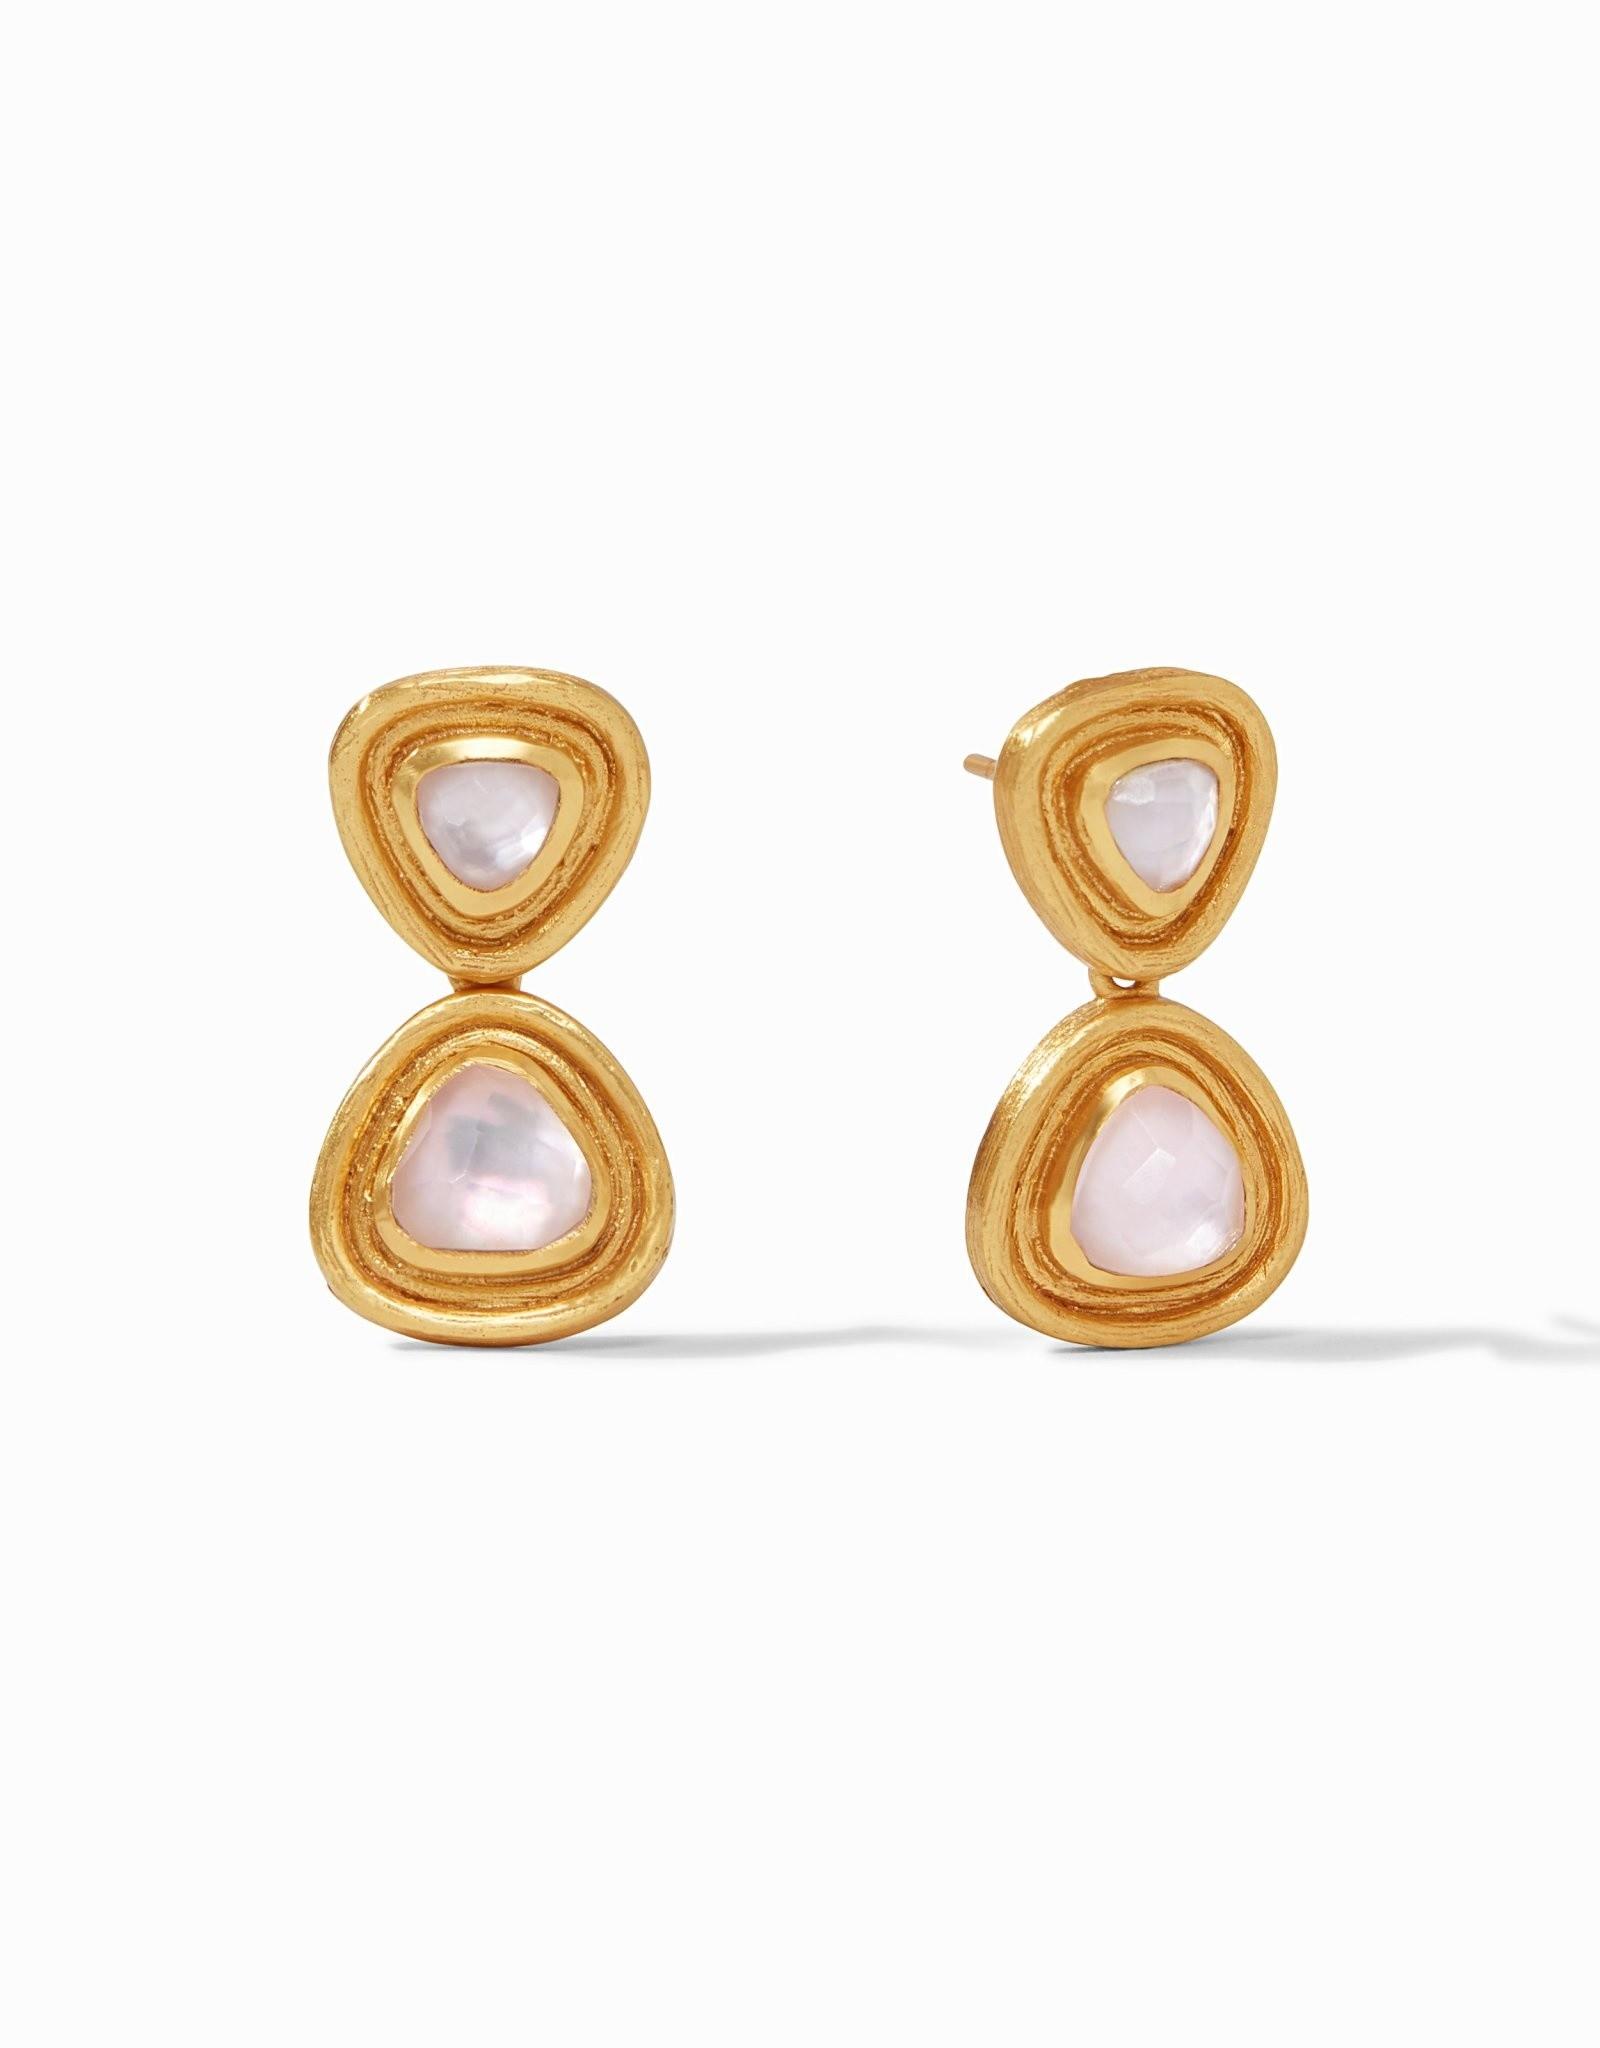 Julie Vos Barcelona Midi Earring Gold Iridescent Rose